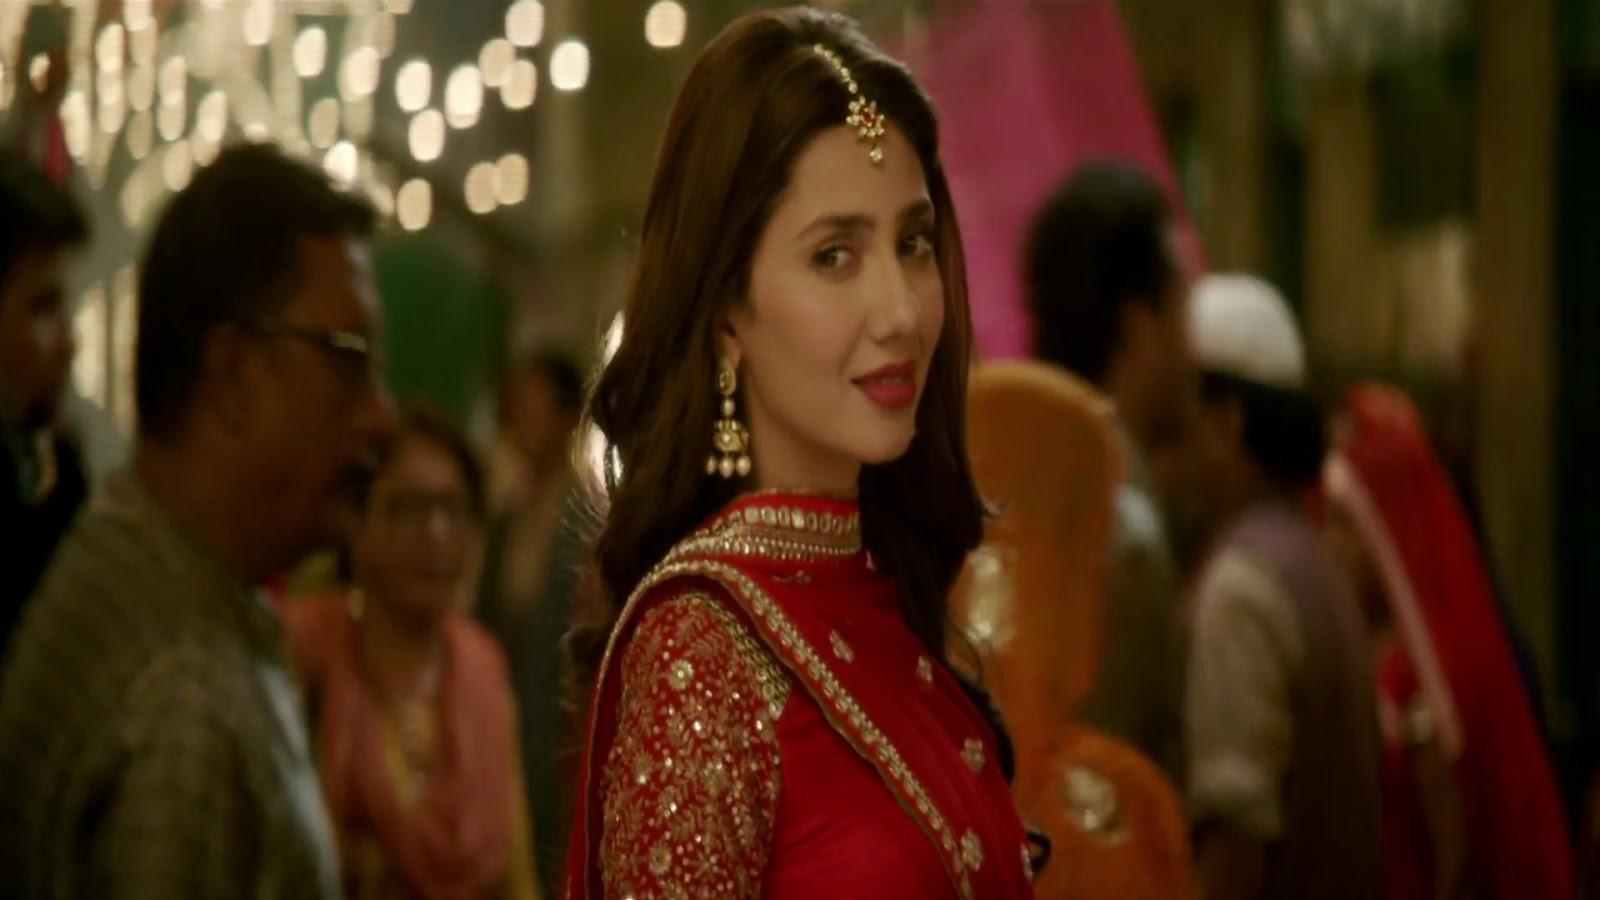 Top Wallpaper Movie Kabil - mahira-khan-in-raees-movie-wallpaper  2018_995114.jpg